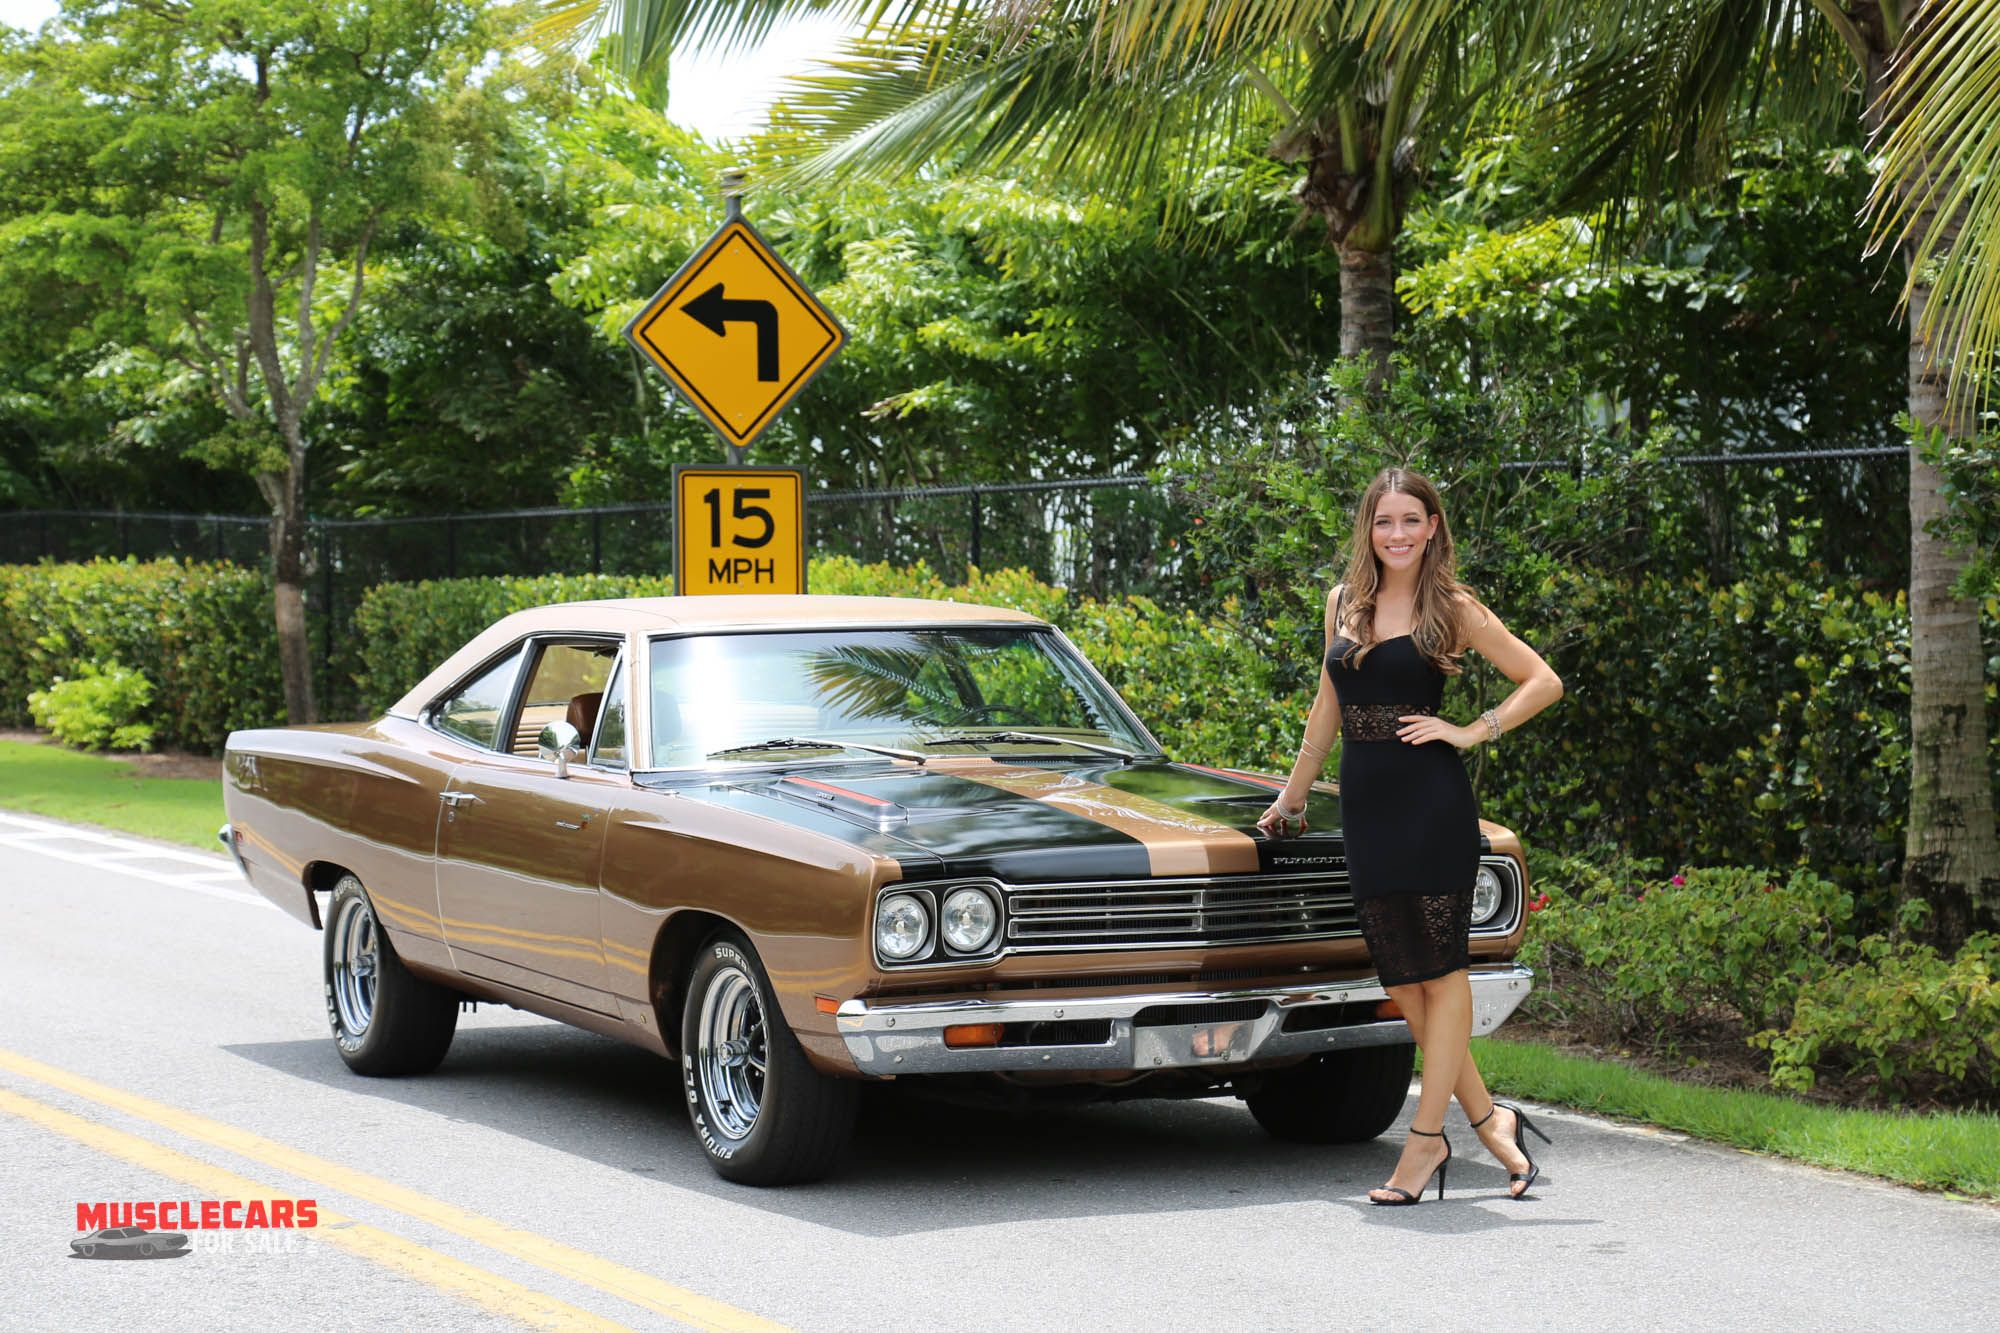 Mercedes Benz Of Greensboro >> Muscle Car Girl   AllCollectorCars.com